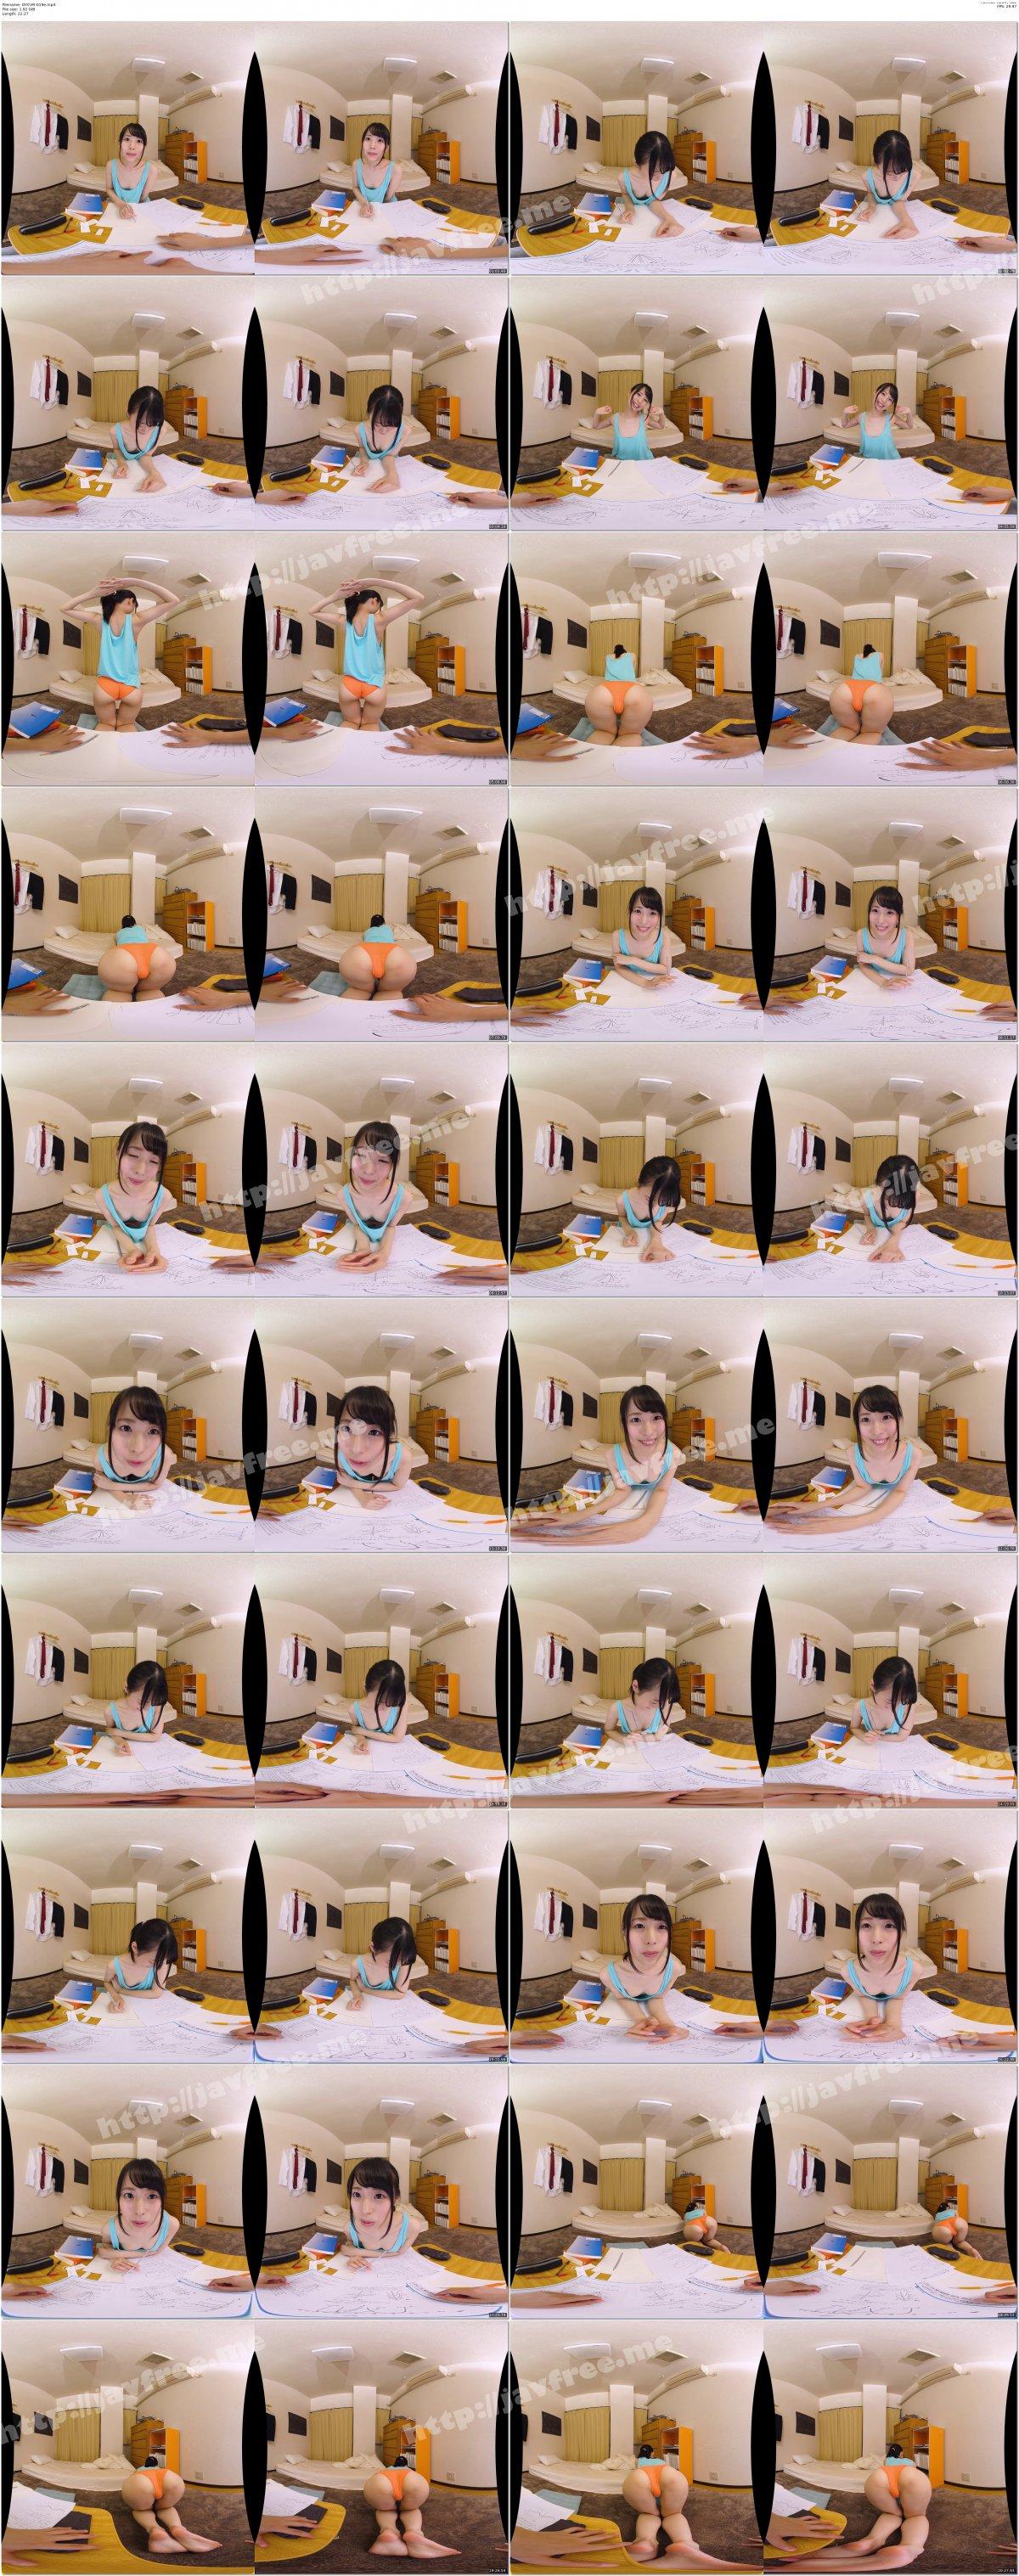 [OYCVR-019] 【VR】VR長尺 義妹VR新作撮り下ろし2作品スペシャルパック!気弱な義妹はボクの言いなり 突然出来たメチャメチャカワイイ義理の妹は超気弱で恥ずかしがり屋!とにかく…+義妹がセフレ!「お願いエッチなこといっぱい教えて…」義理の妹がまさかのお願い!!突然出来た… - image OYCVR-019e on https://javfree.me